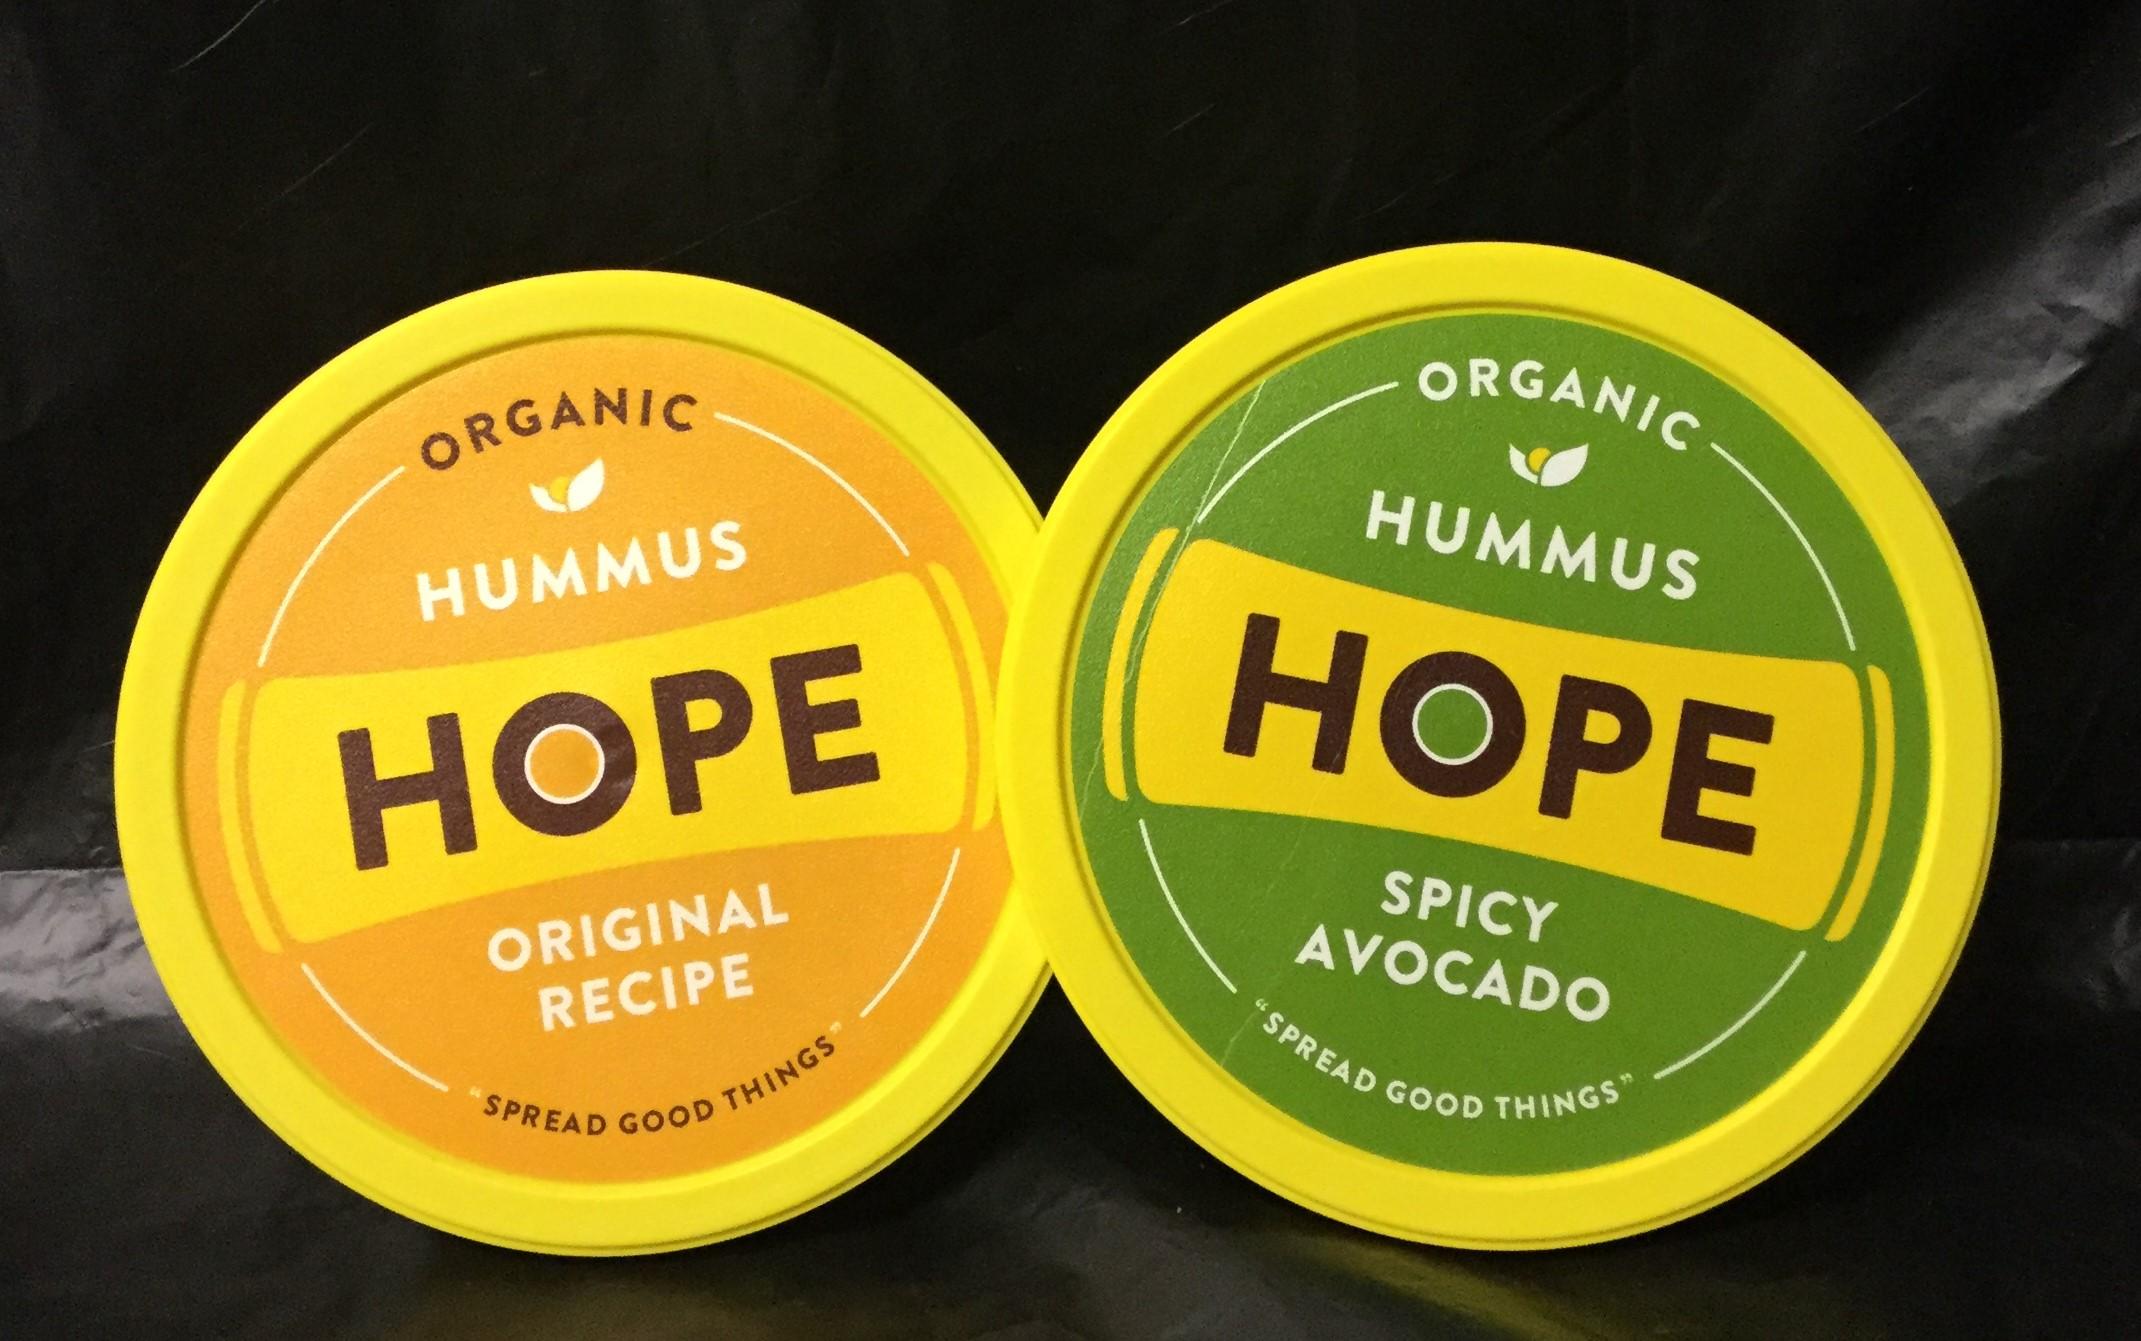 HOPE Organic Hummus - 8 oz